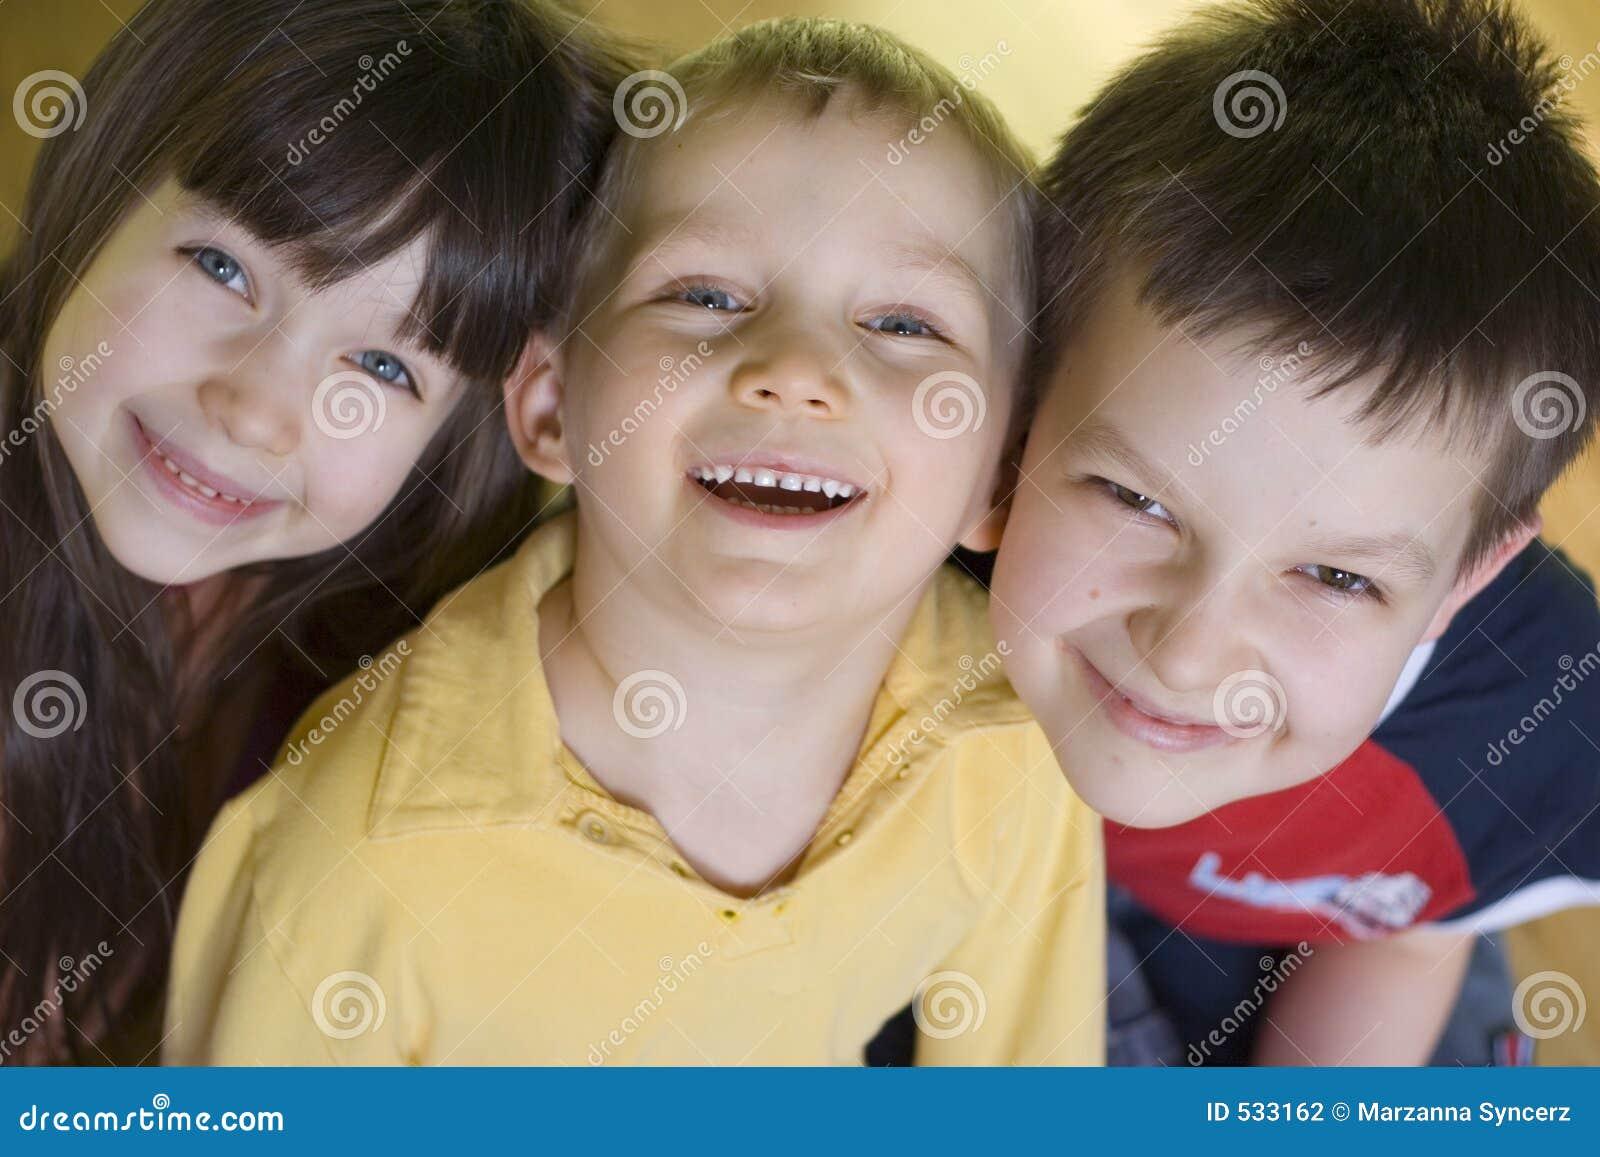 Download 孩子微笑 库存照片. 图片 包括有 表面, 系列, 姐妹, 可爱, 子项, 幸福, 微笑, 眼睛, 团体, 孩子 - 533162